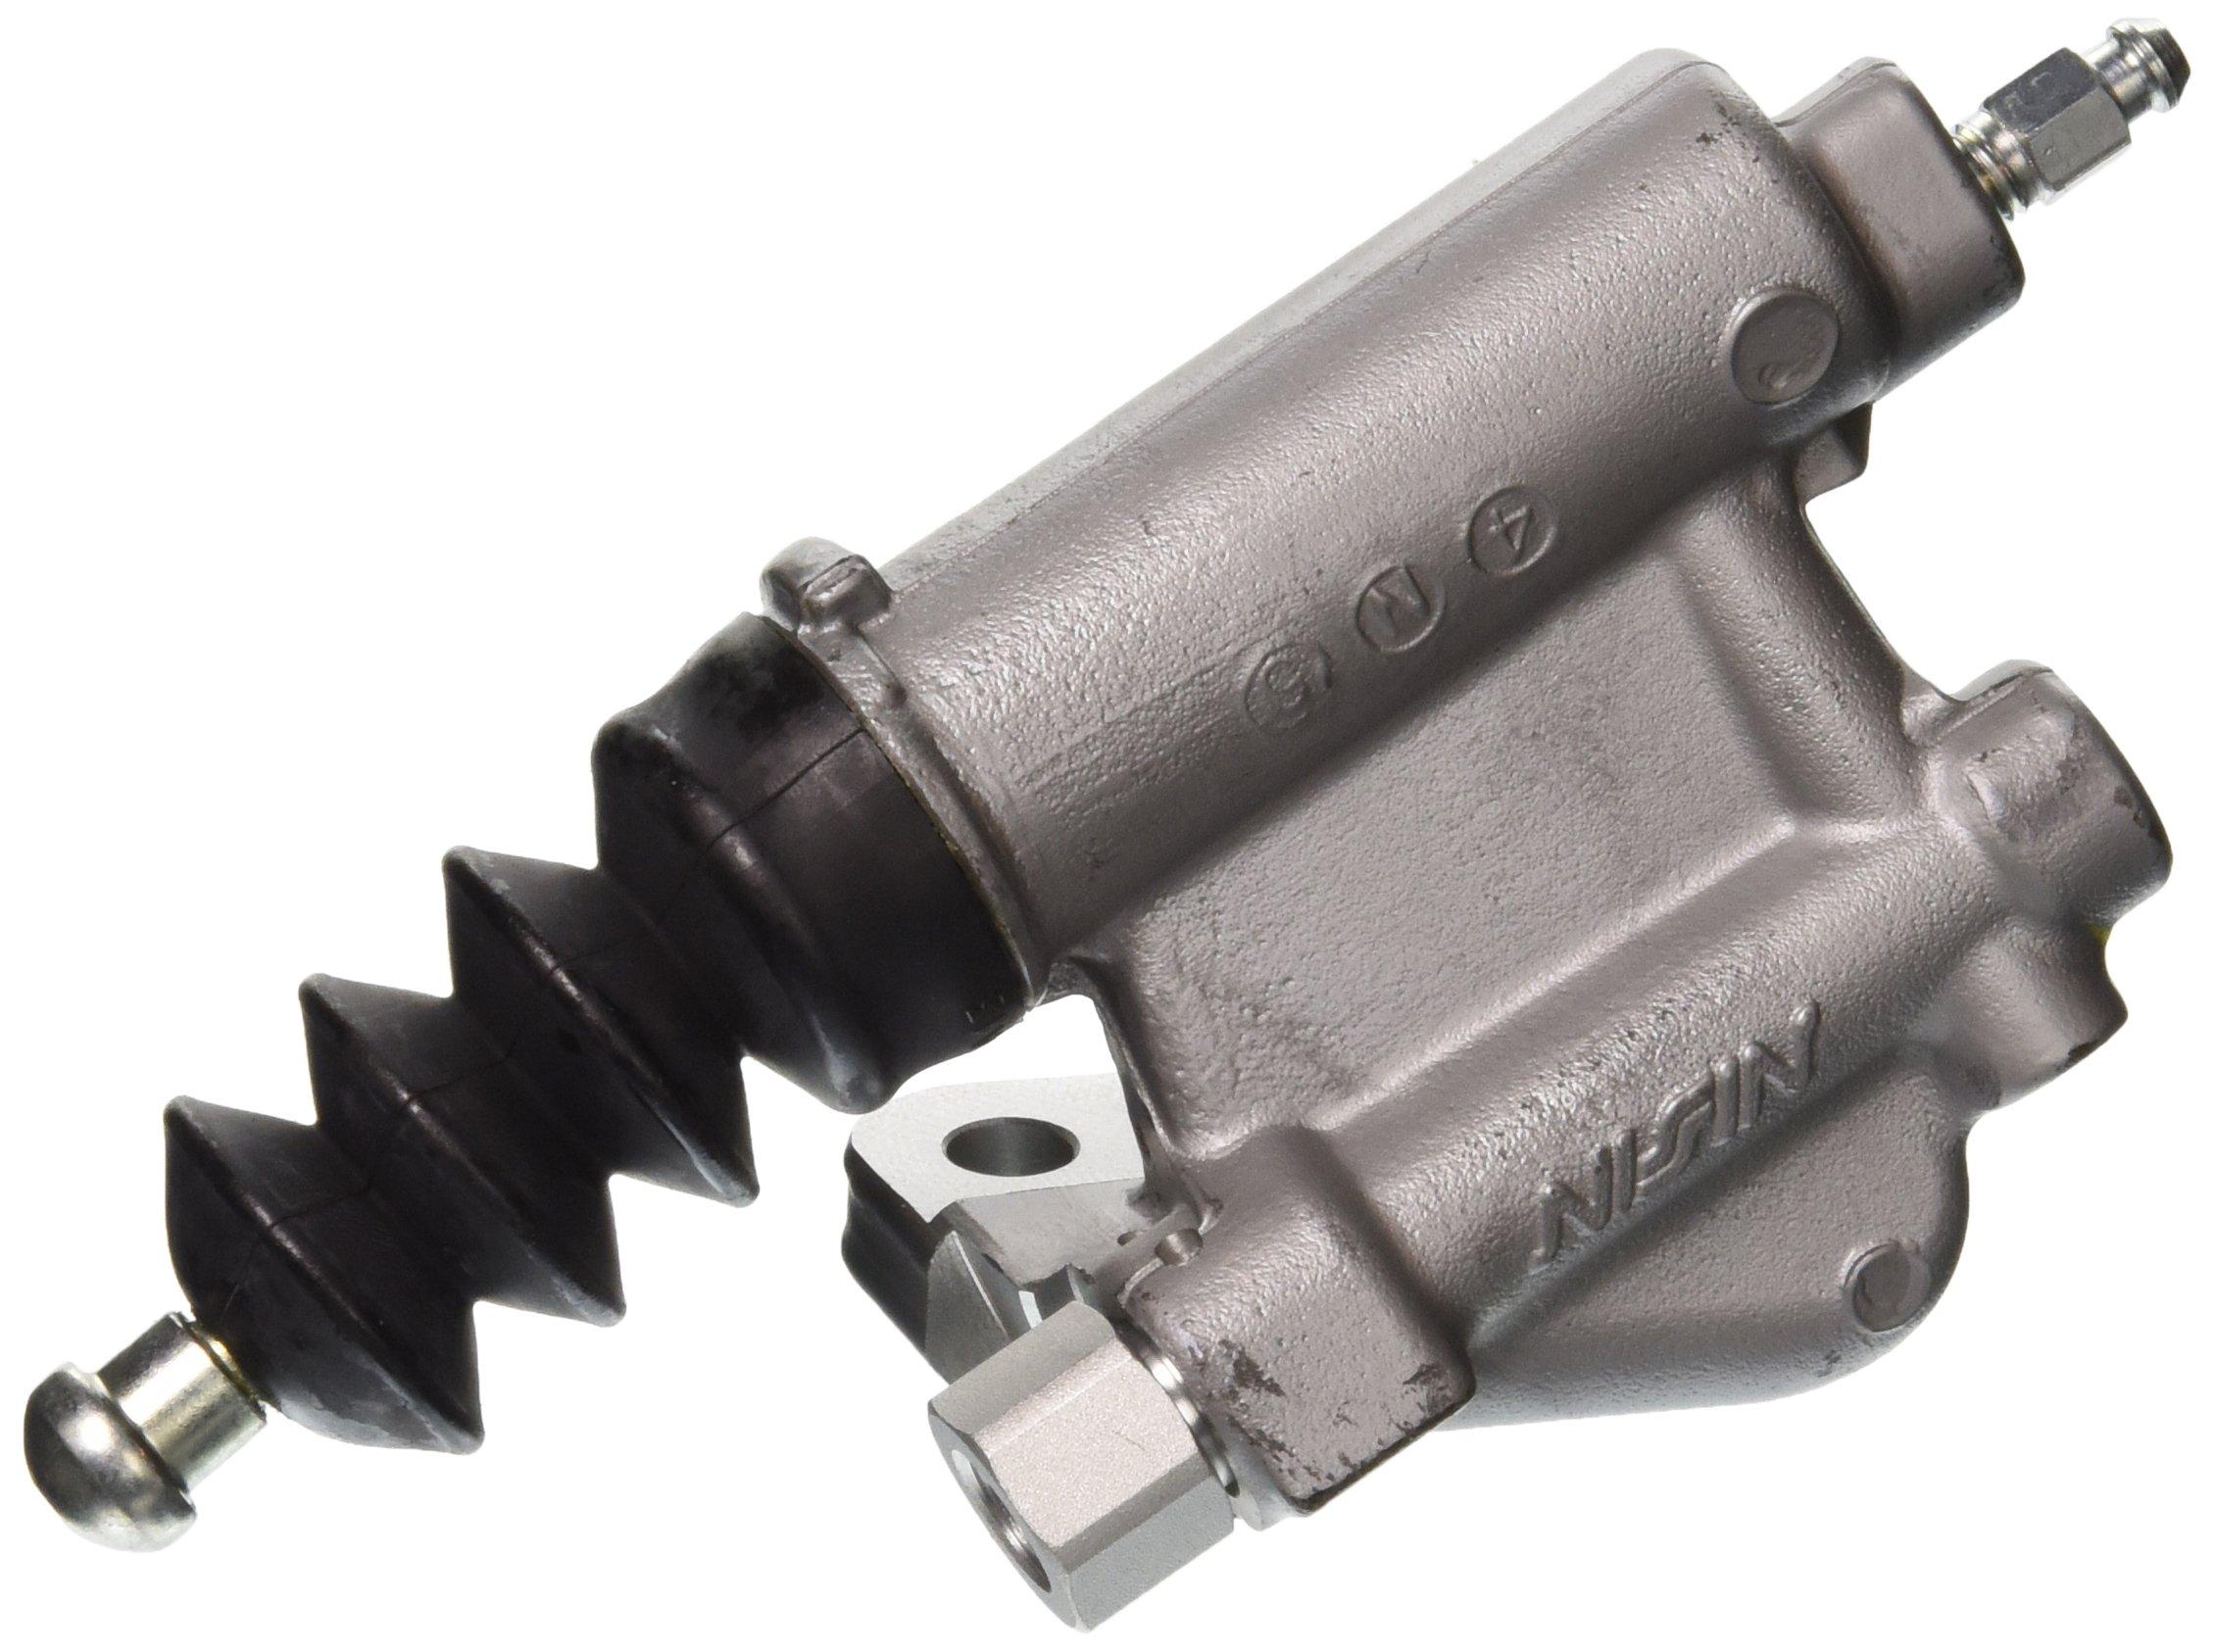 Genuine Honda 46930-SWA-G01 Clutch Slave Cylinder Assembly